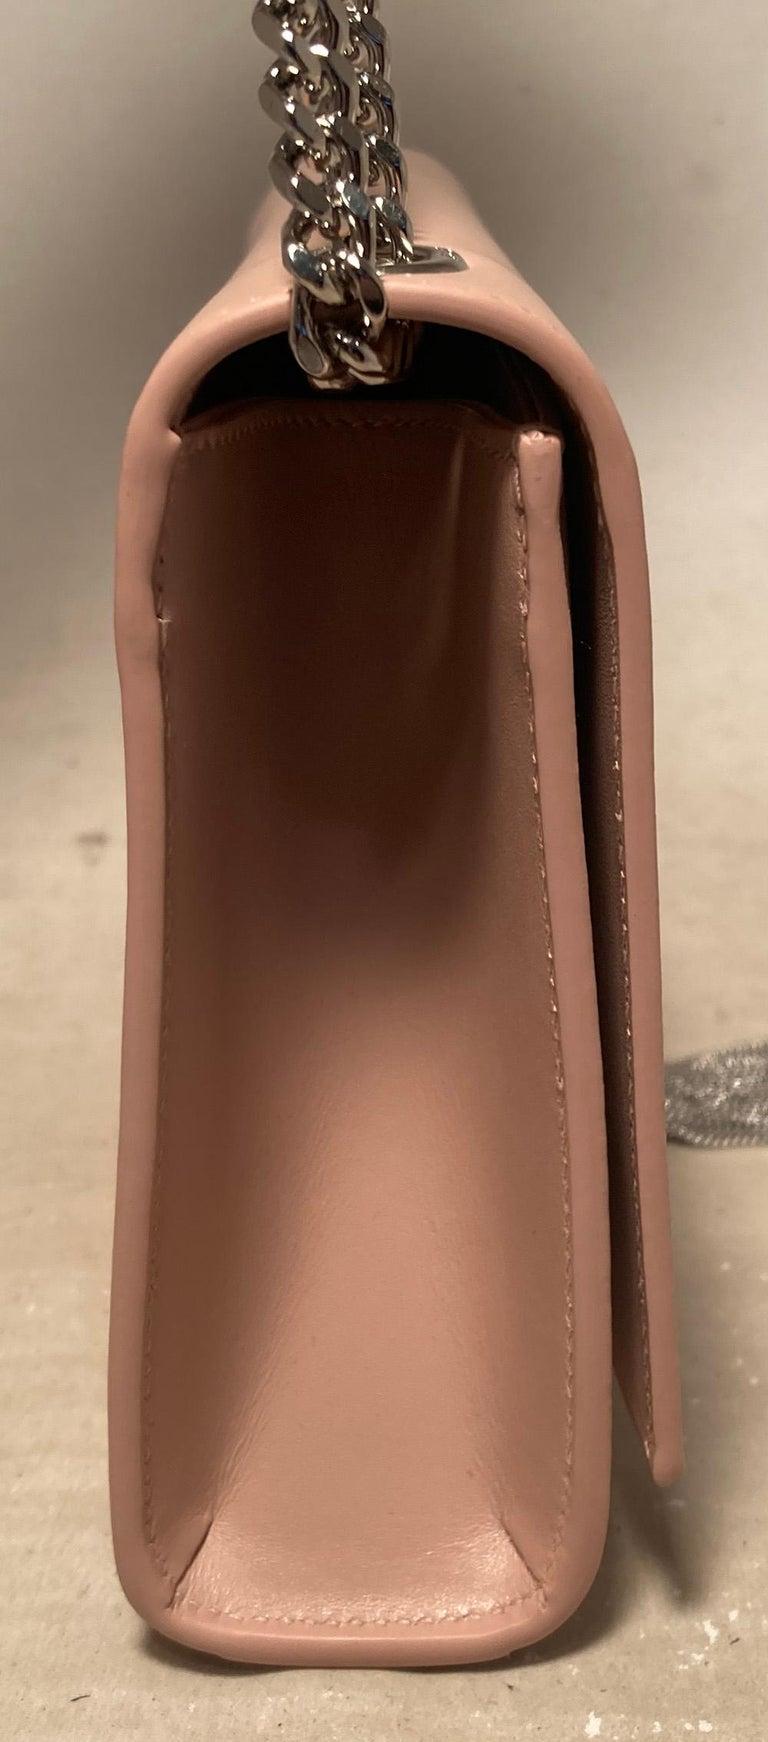 NWOT Saint Laurent Medium Kate Monogram Tassel Bag in Pale Pink. 9.25